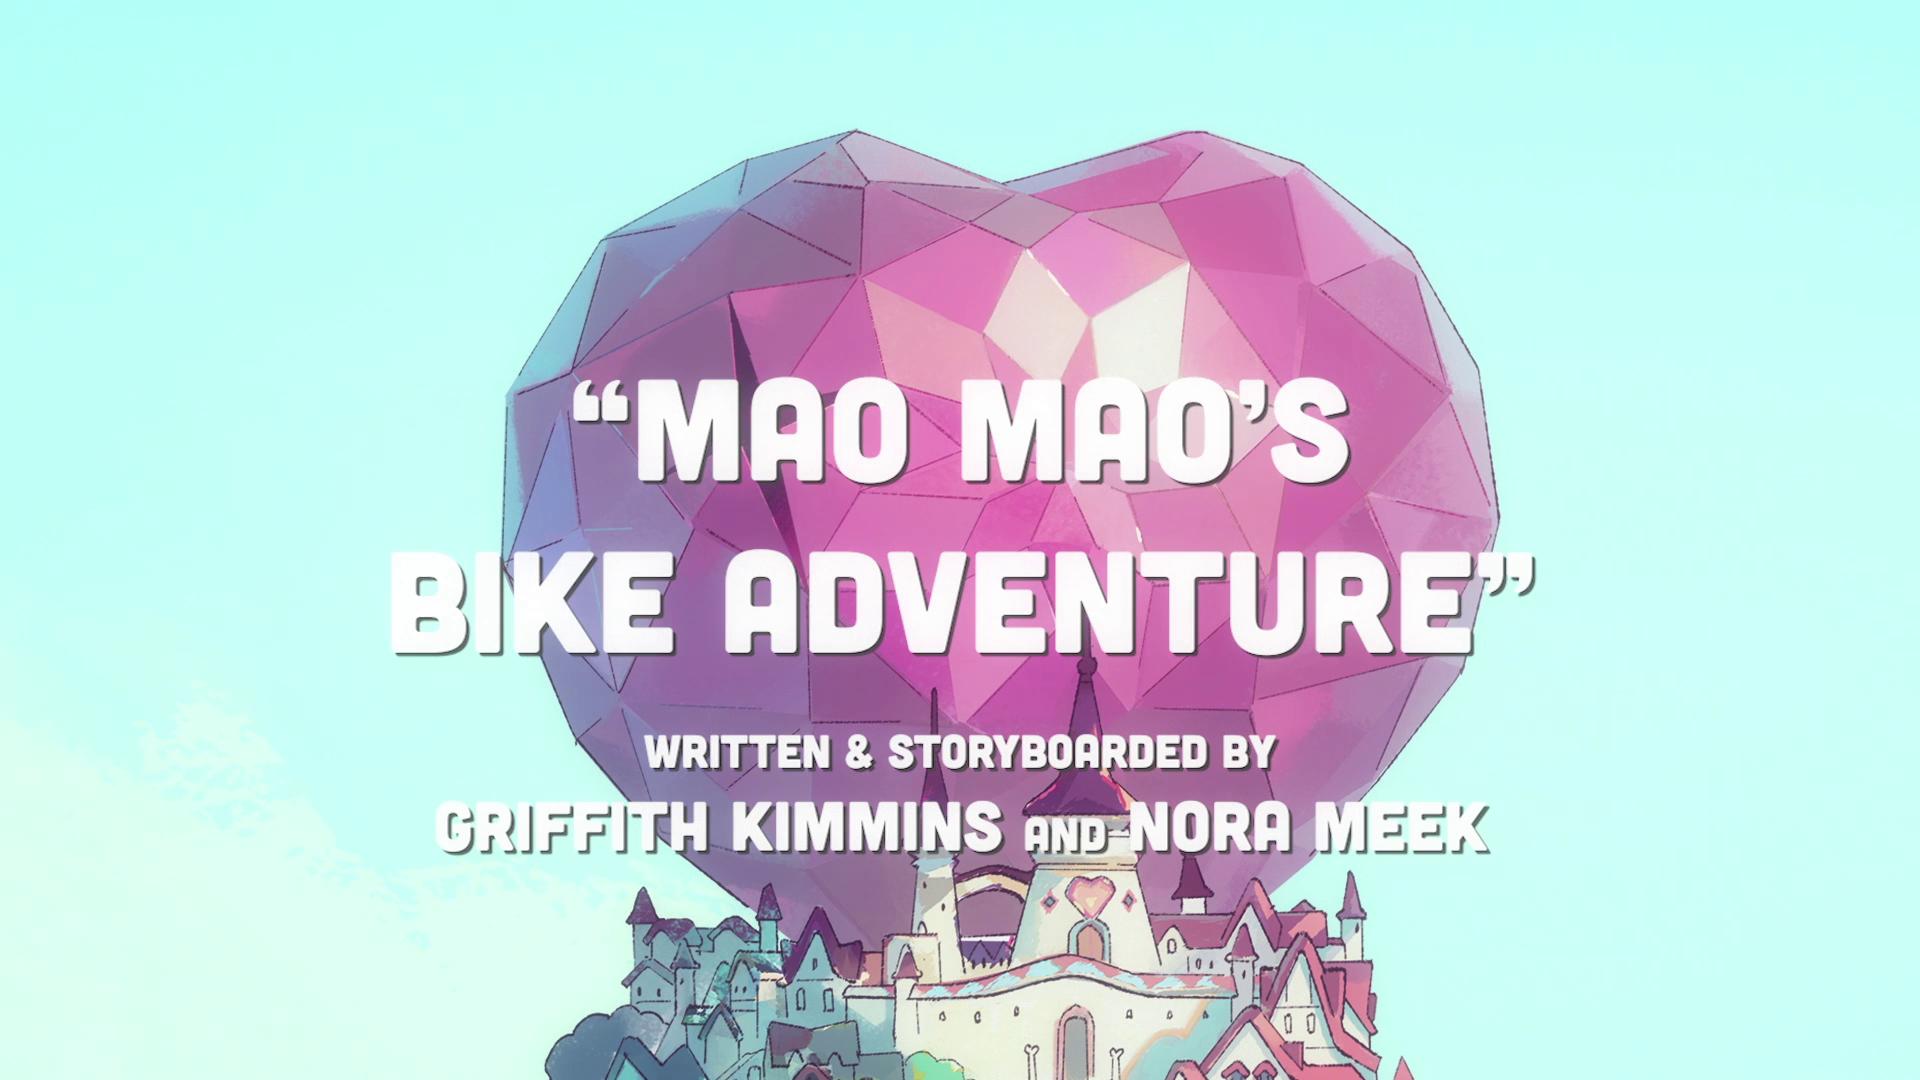 Mao Mao's Bike Adventure